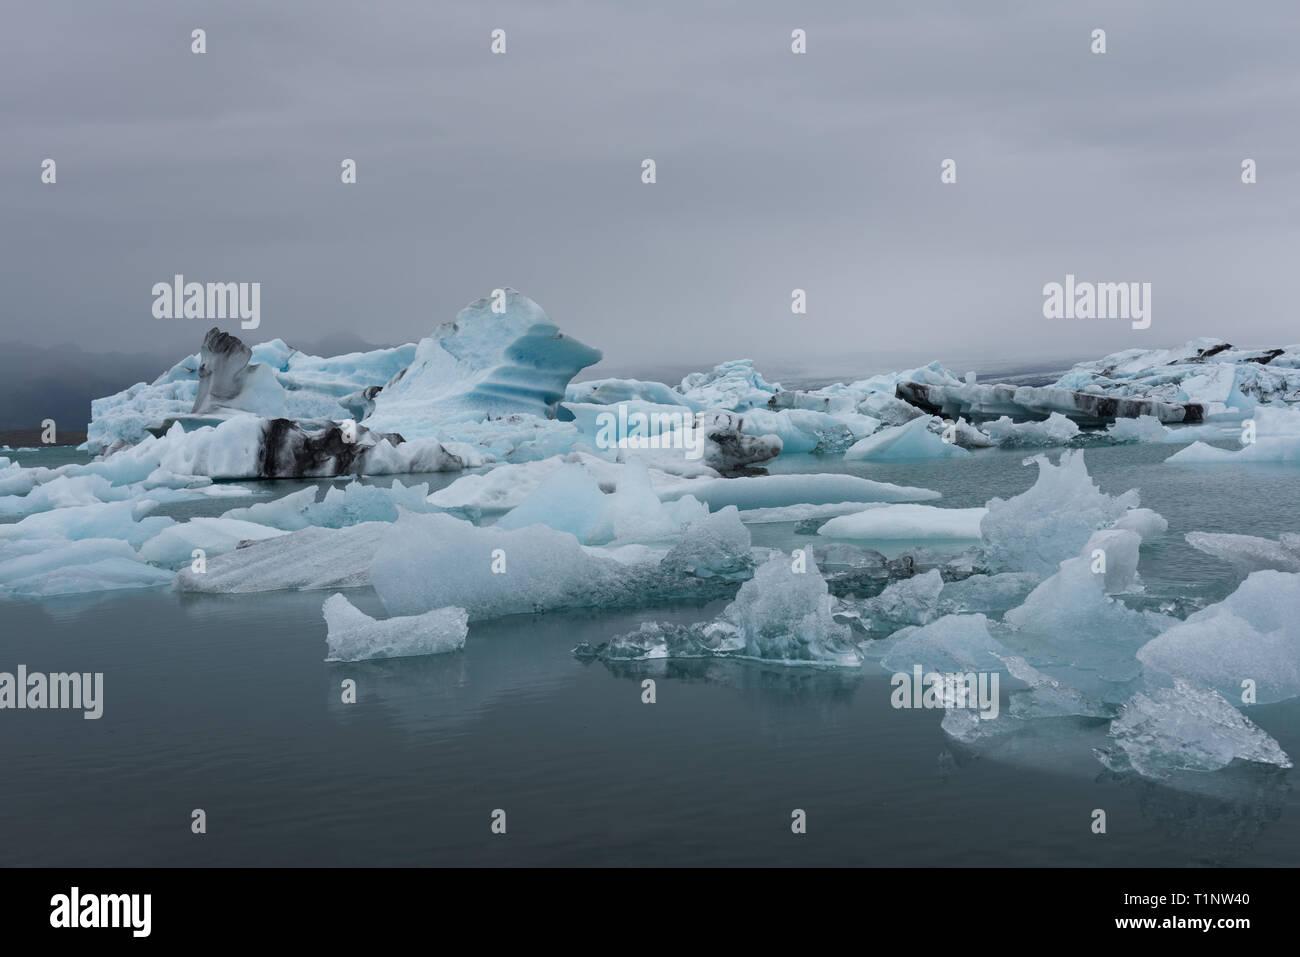 Iceland, Jokulsarlon lagoon, Beautiful cold landscape picture of icelandic glacier lagoon bay - Stock Image